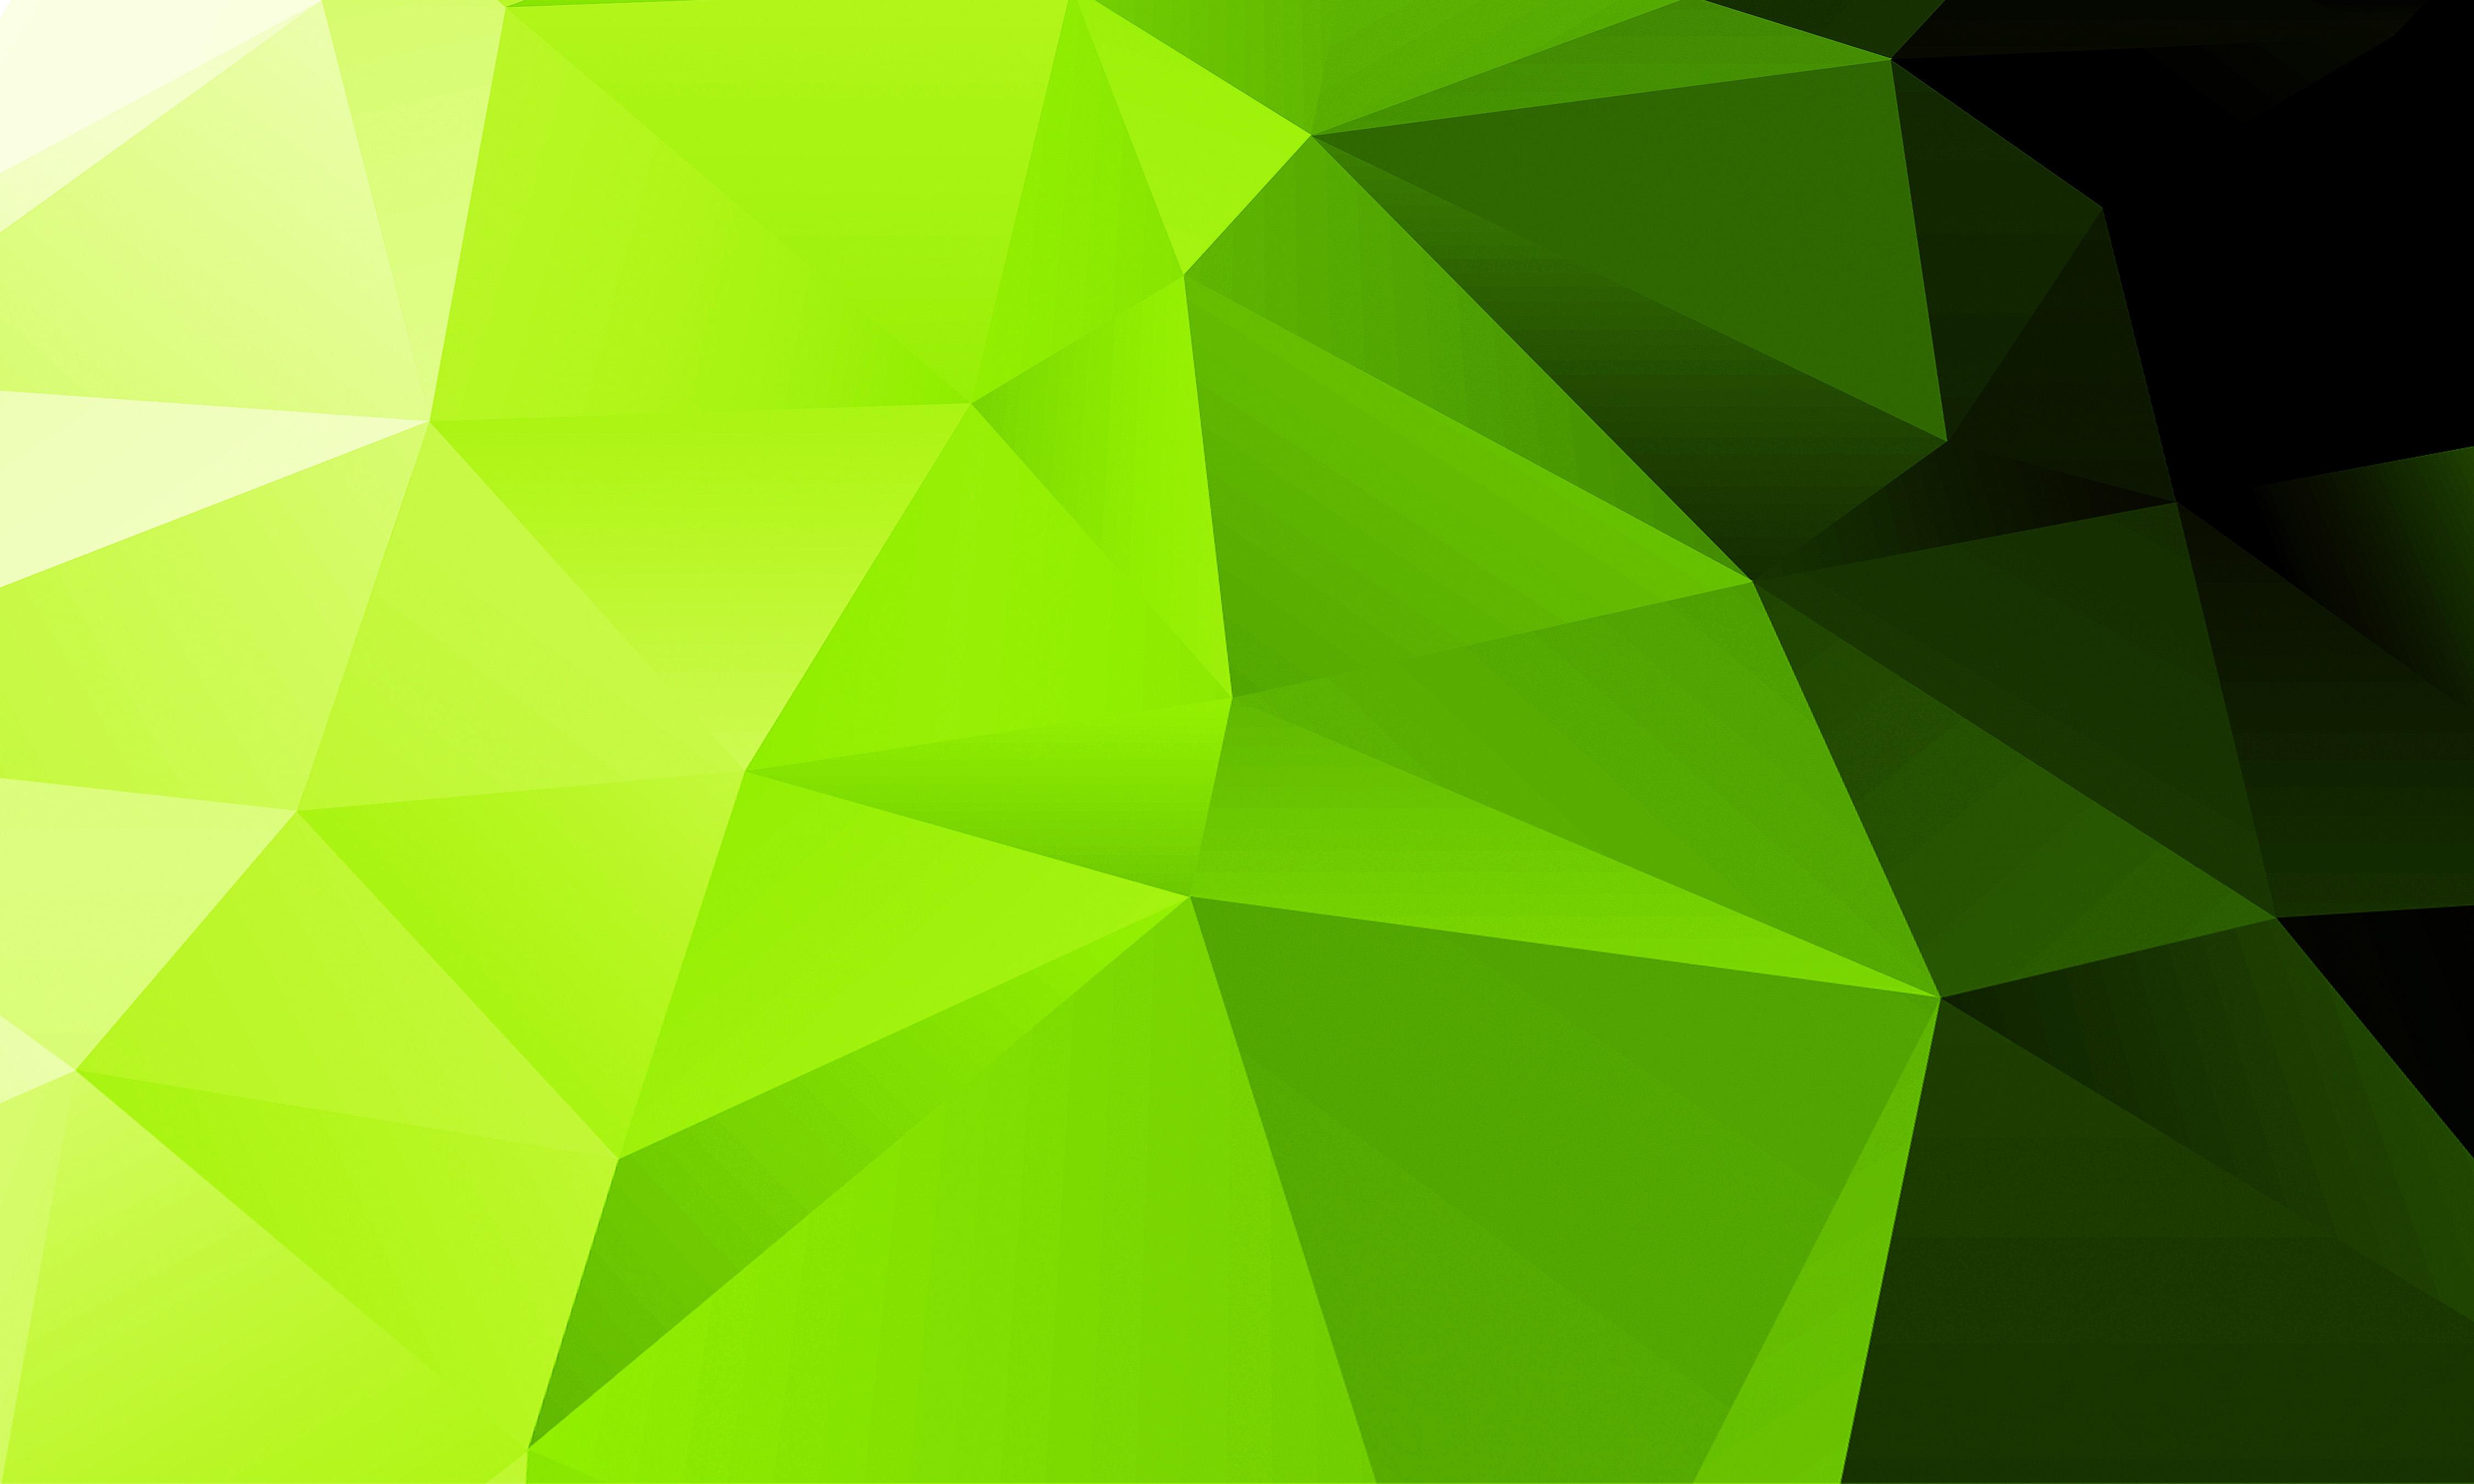 Polygonal Mosaic Background, 3d, Retro, New, Origami, HQ Photo